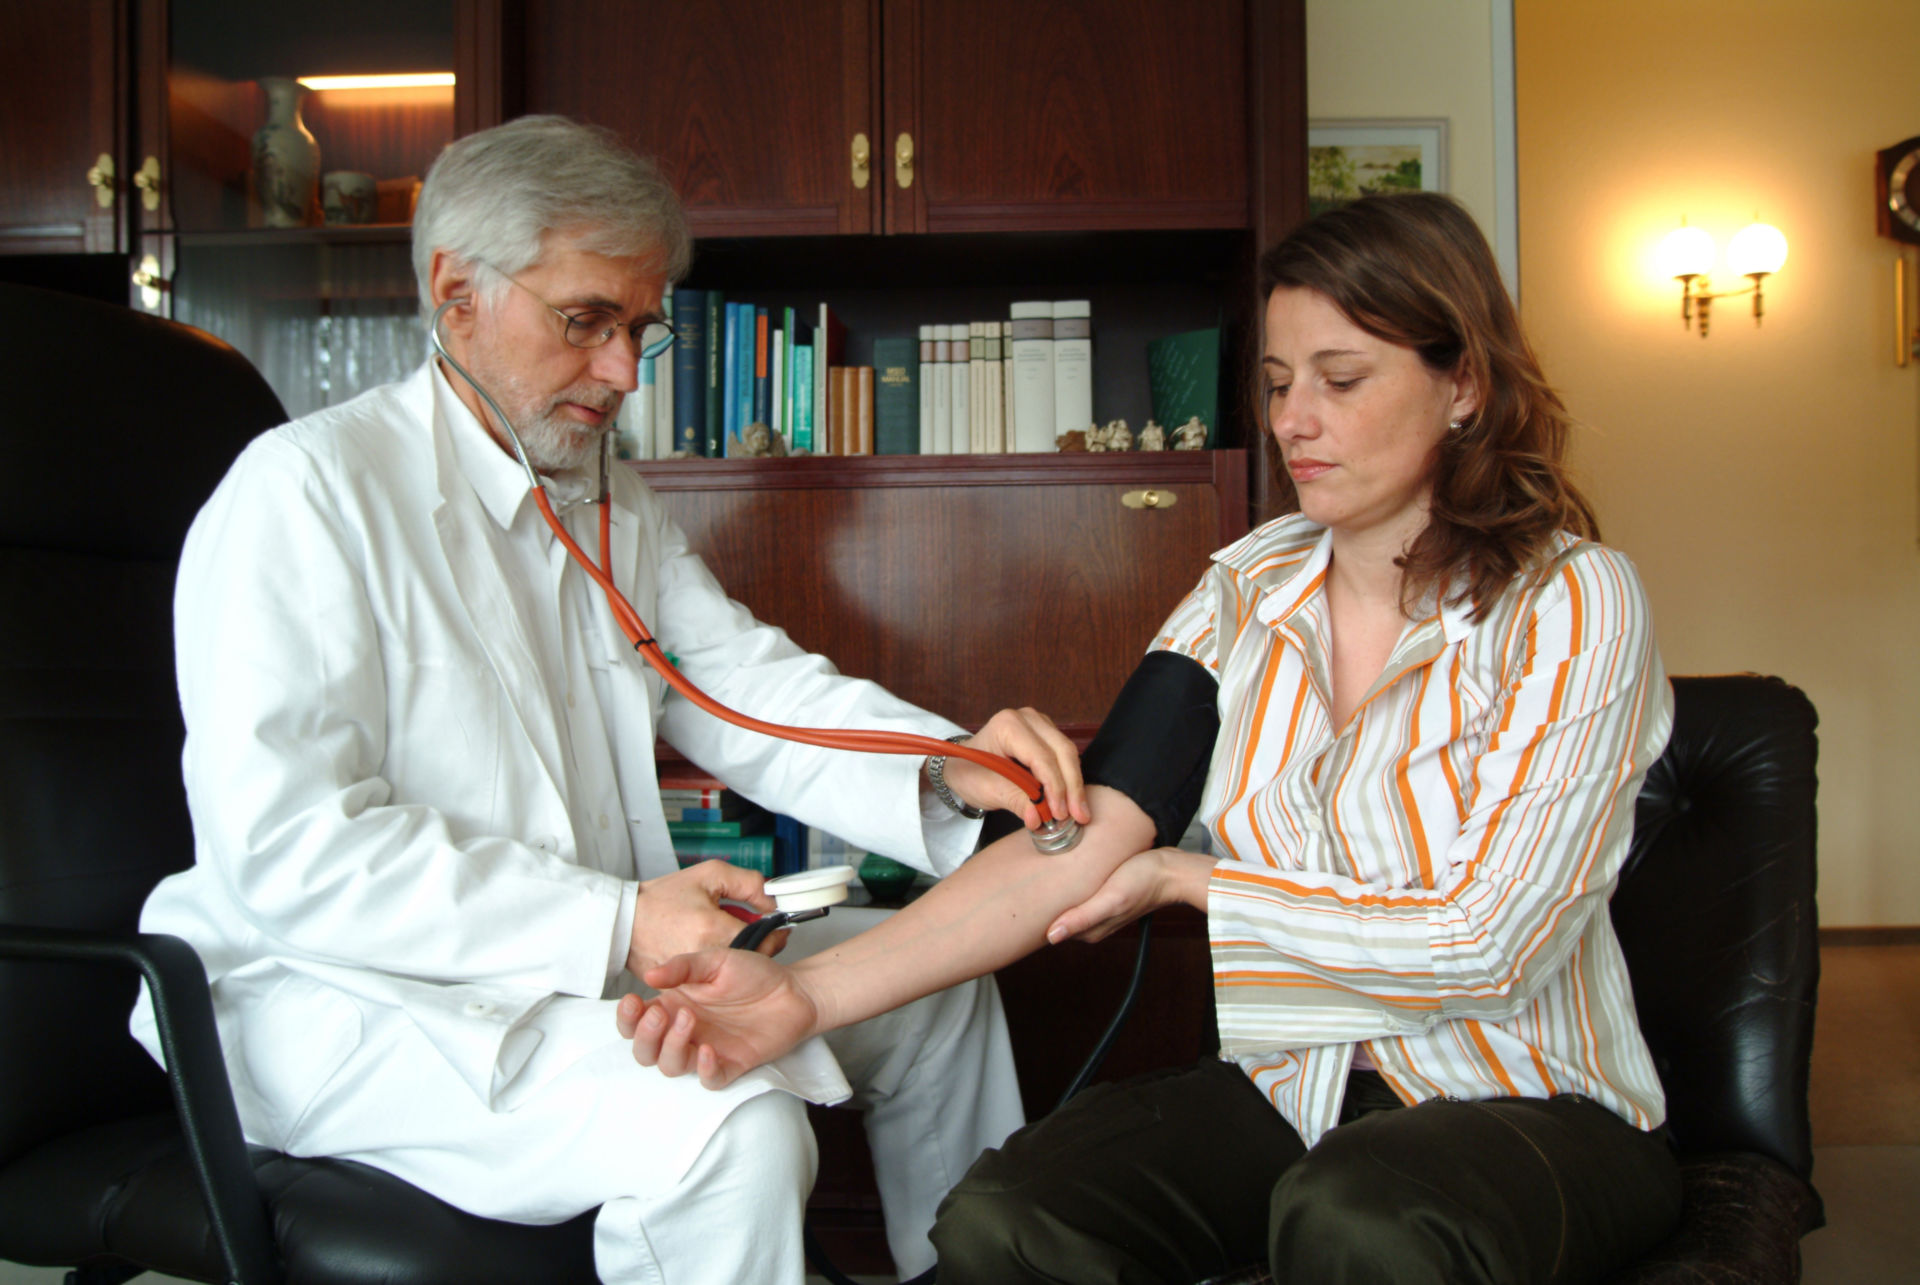 Blood pressure measurement (3)